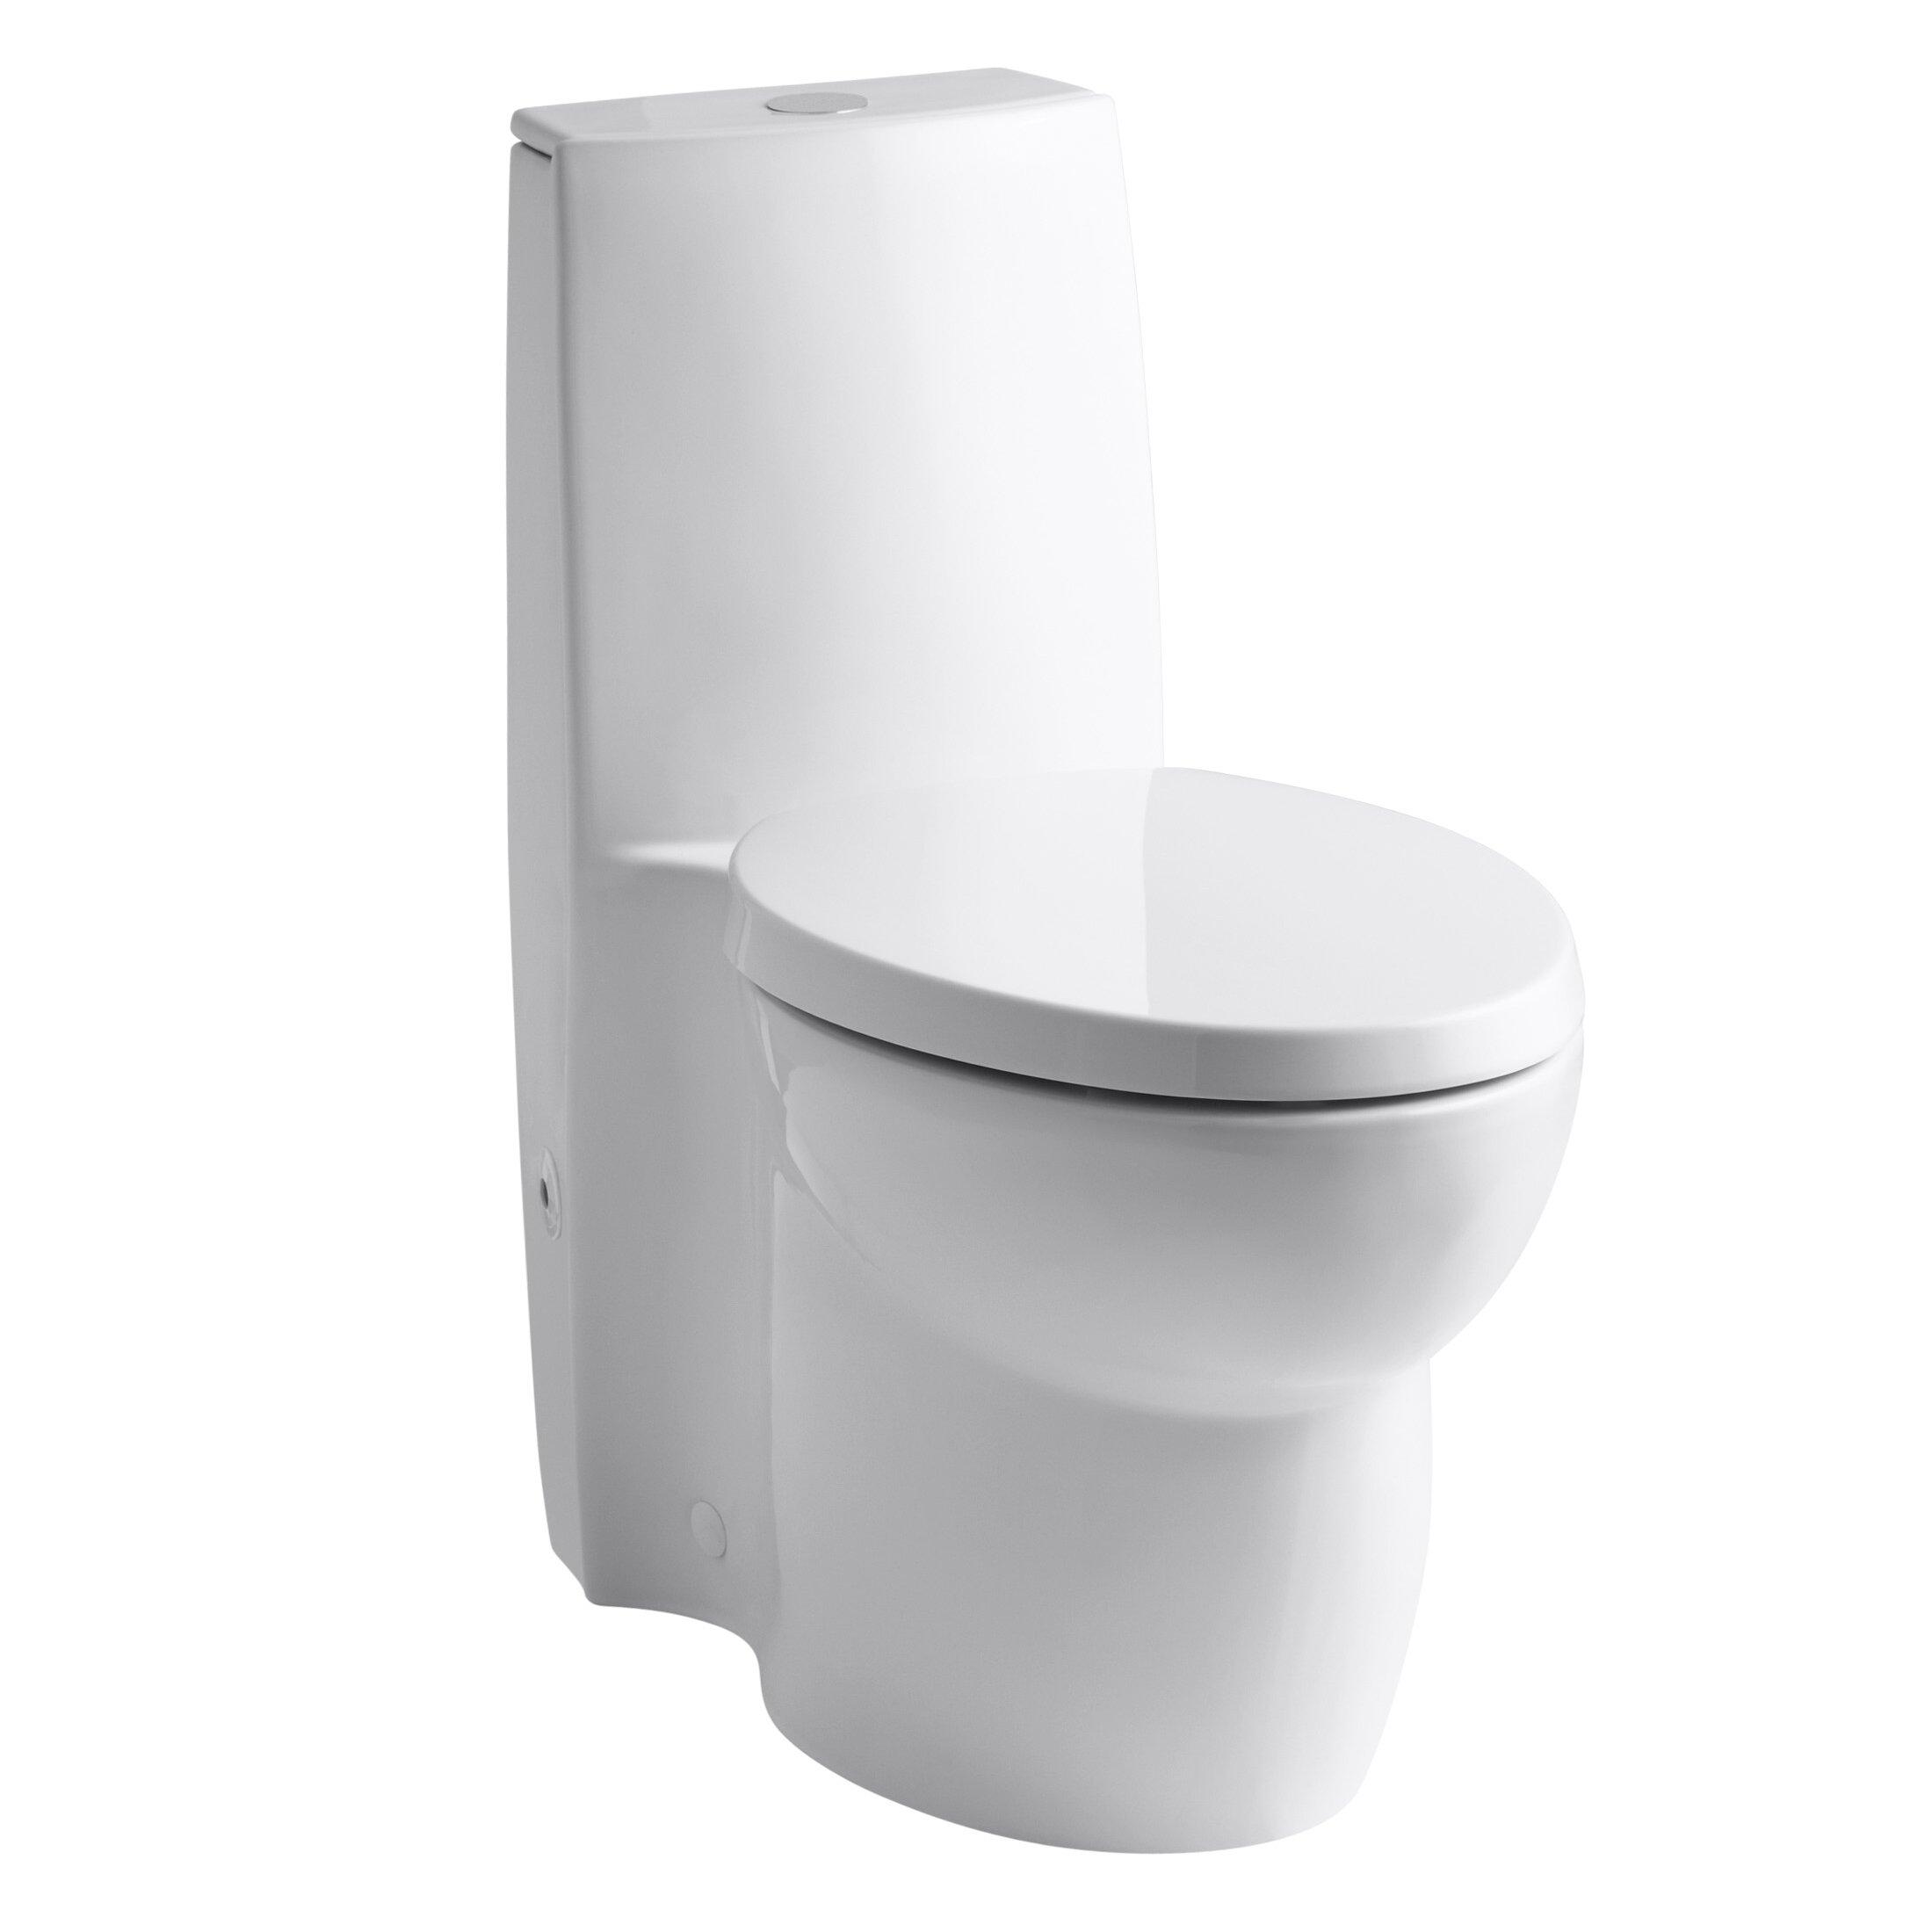 Kohler Saile Skirted One Piece Elongated Dual Flush Toilet